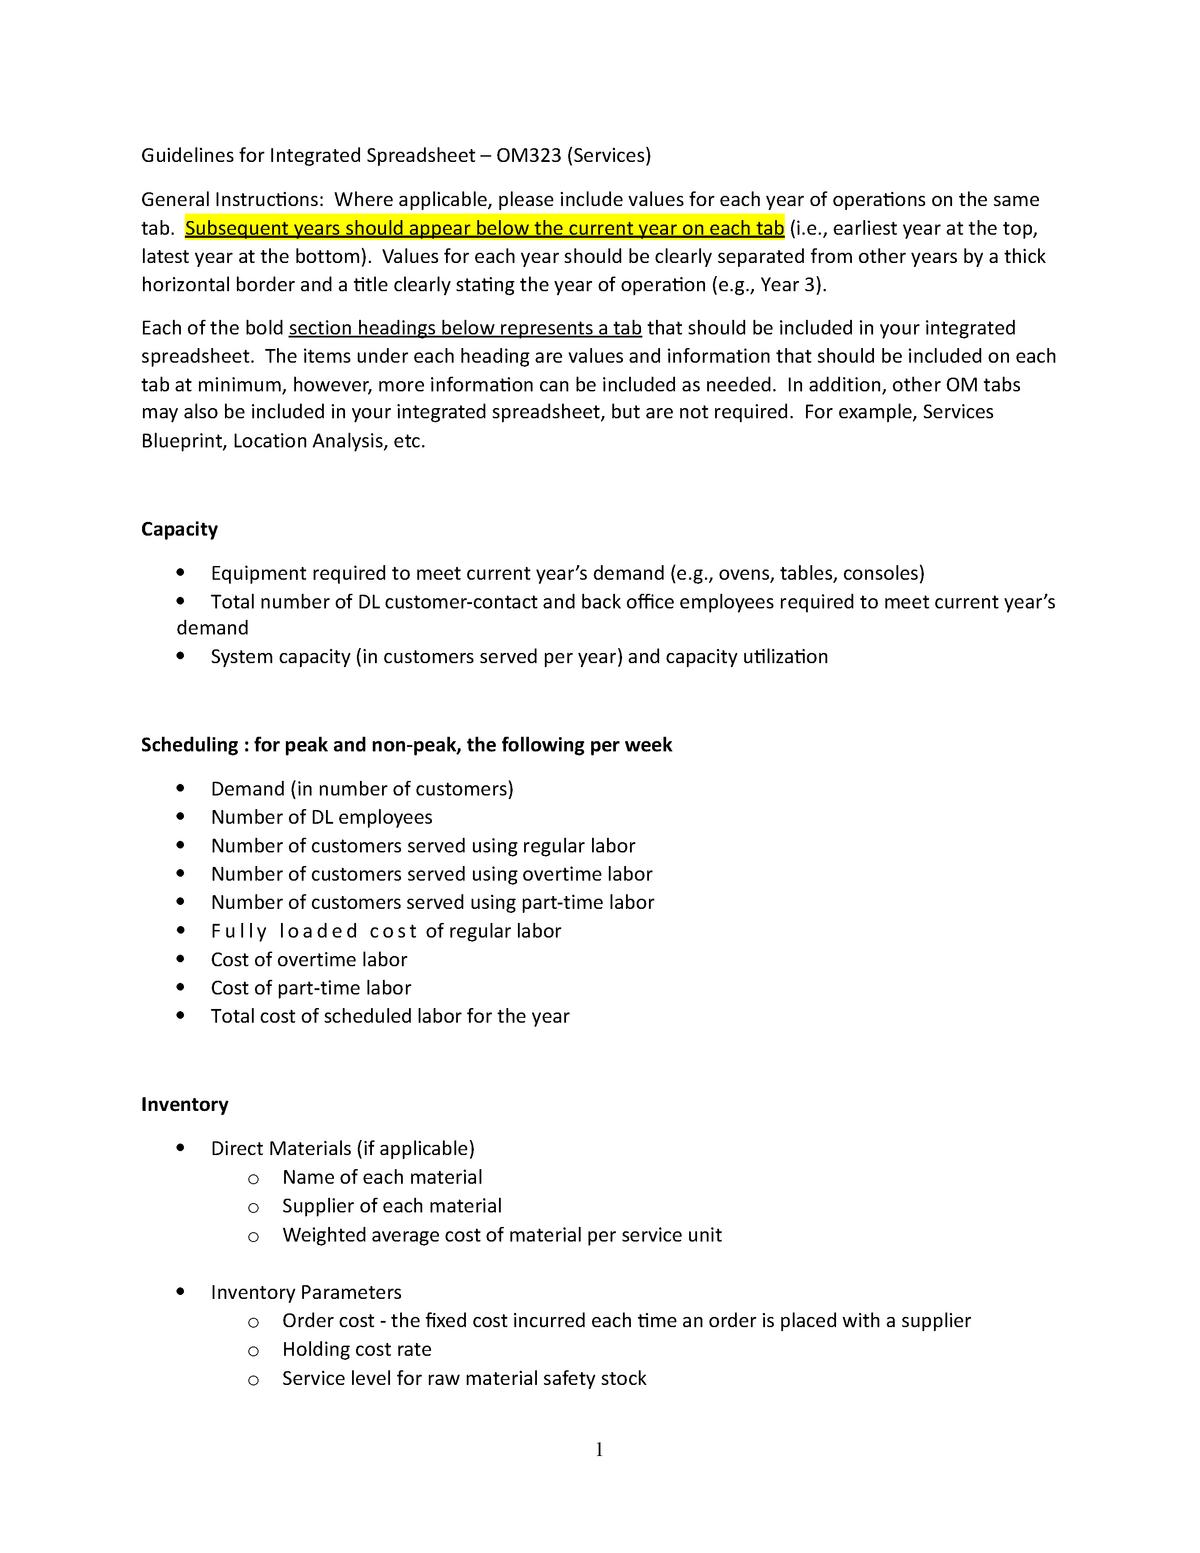 Guidelines for Integrated Workbook OM323 Services - StuDocu